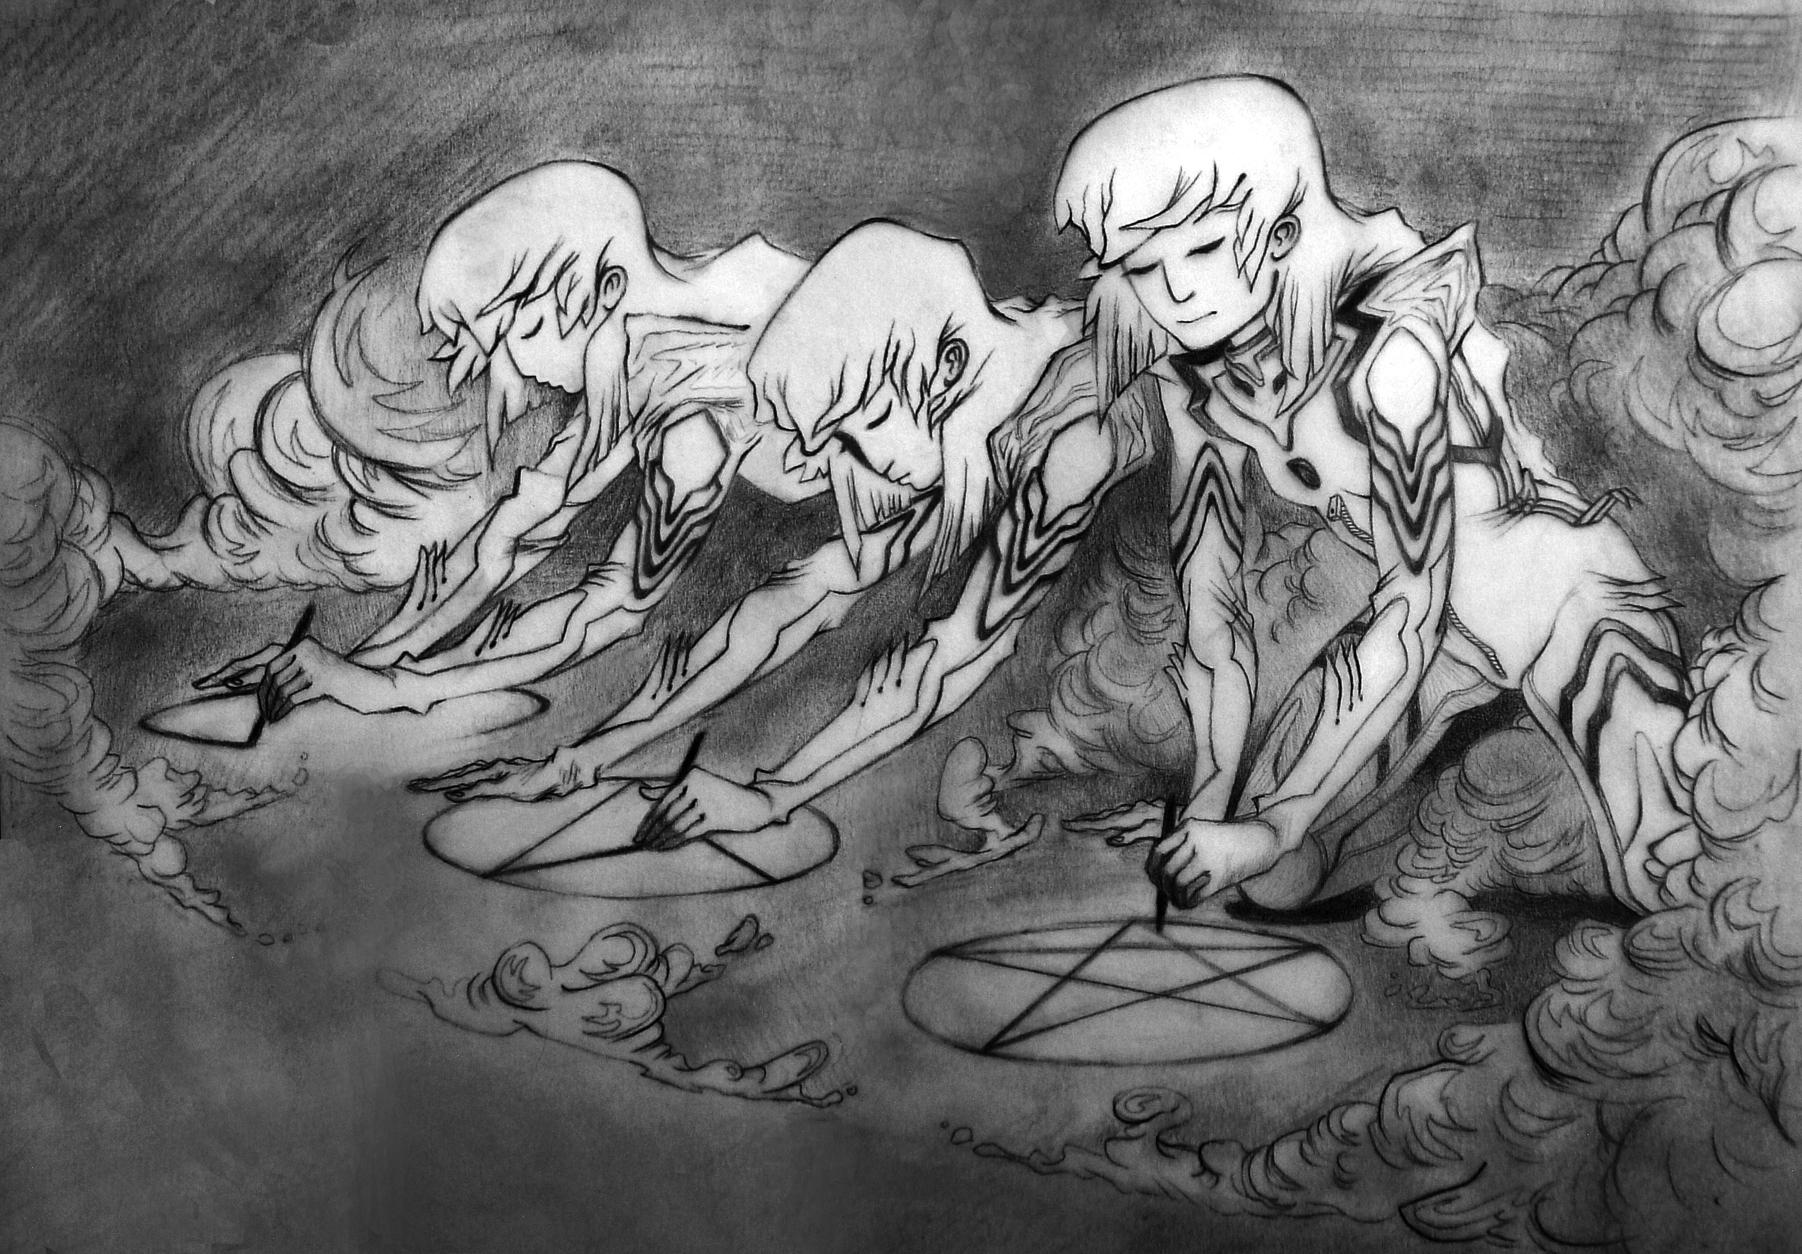 Conjure by radioactivepoo